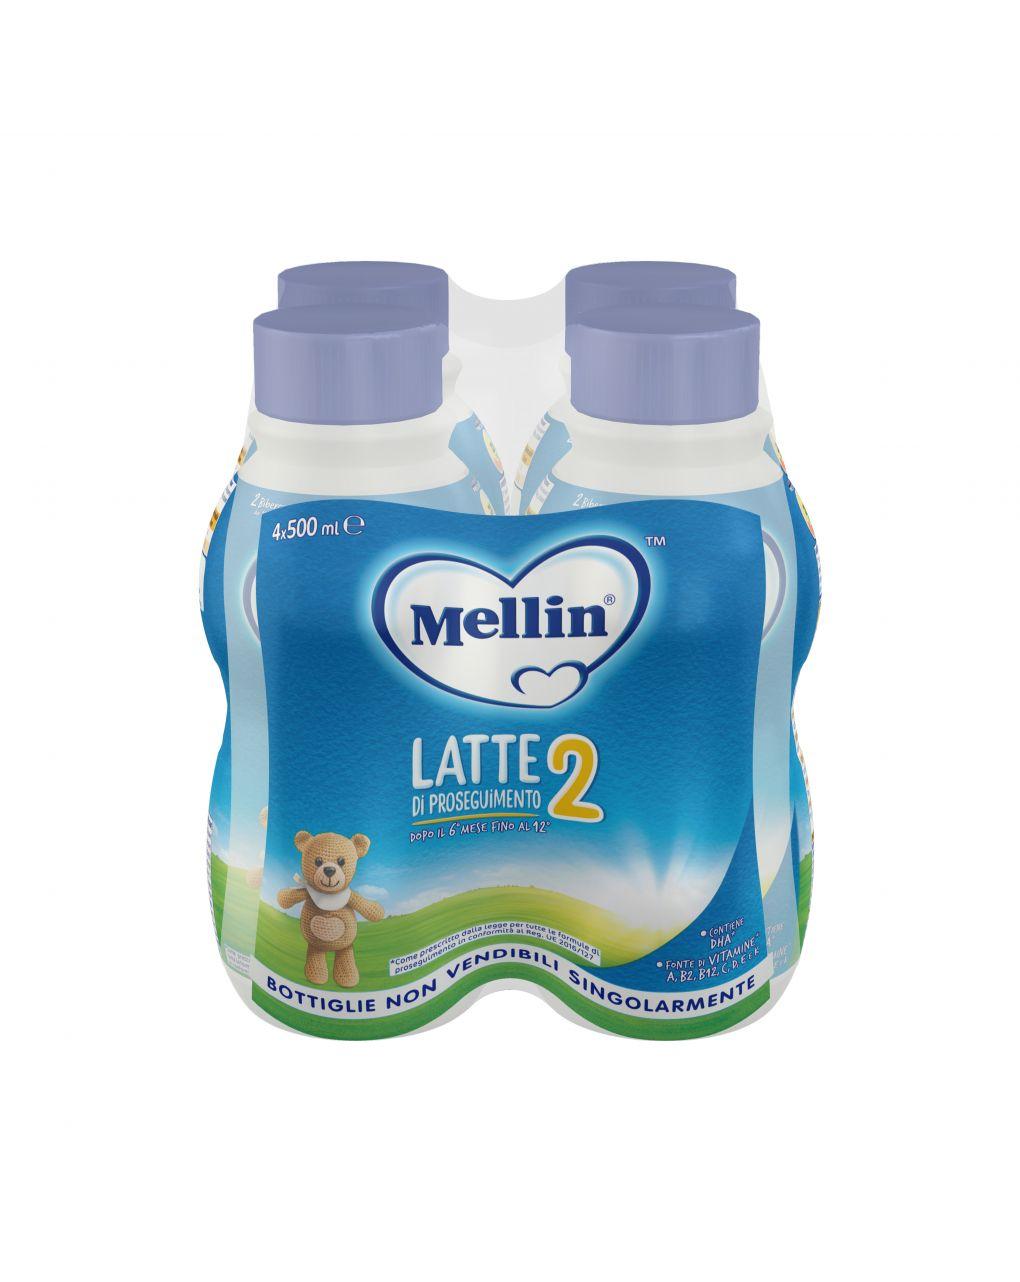 Mellin - latte mellin 2 liquido 4x500ml - Mellin